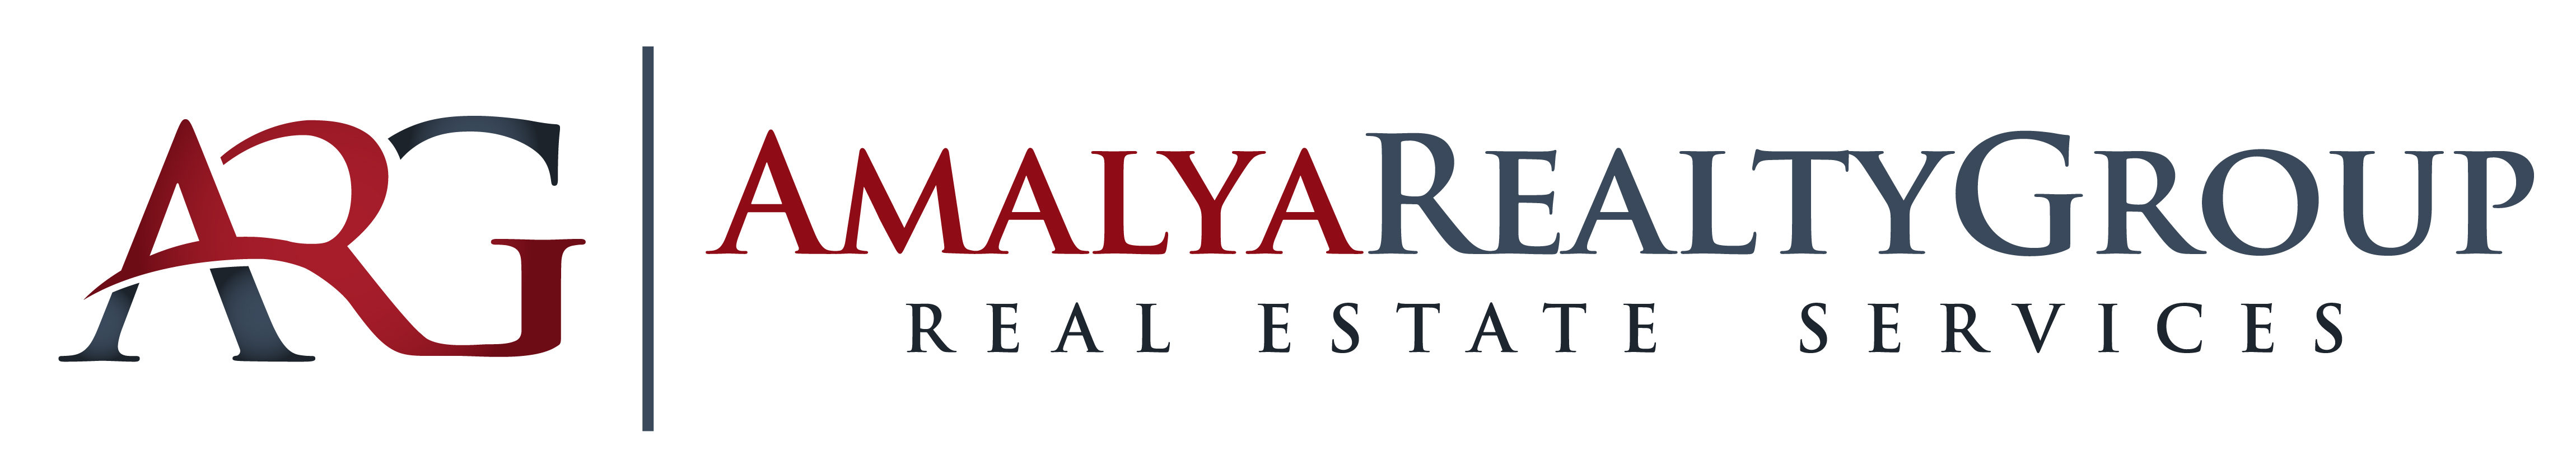 https://www.amalyarealtygroup.com/wp-content/uploads/2017/08/cropped-AmalyaRealtyGroup_real-estate-services_big-darker-01.jpg